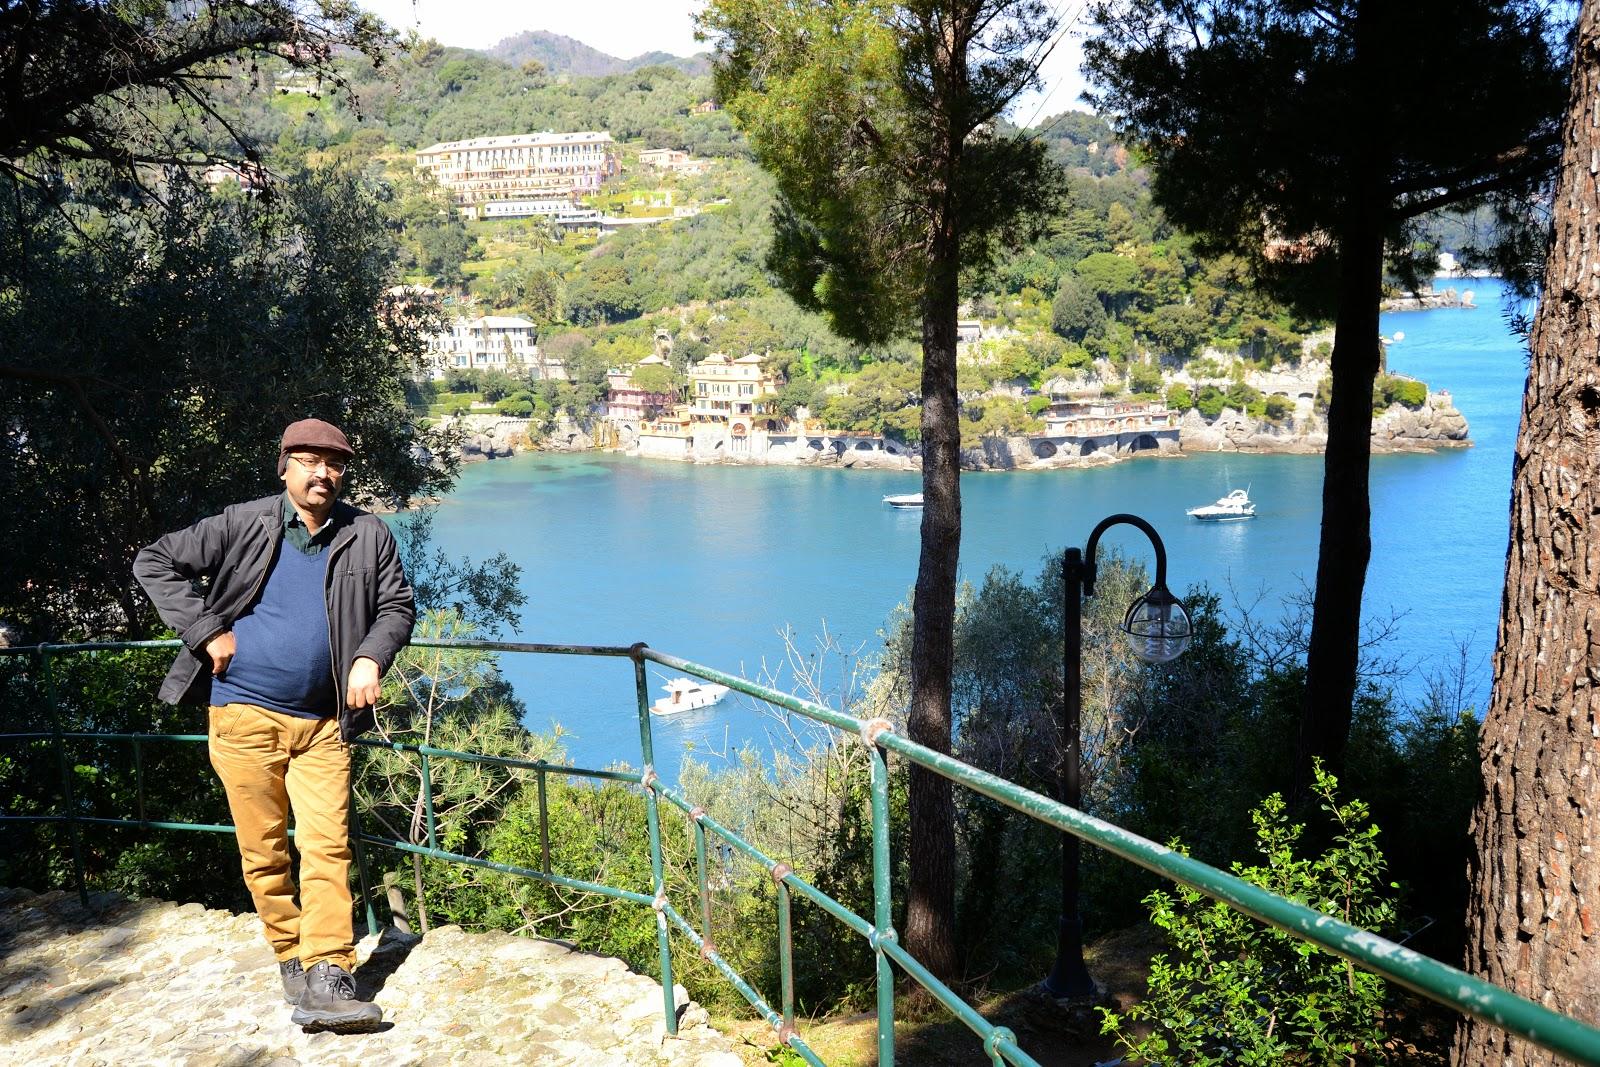 Maheshwaran Jothi @ Portofino